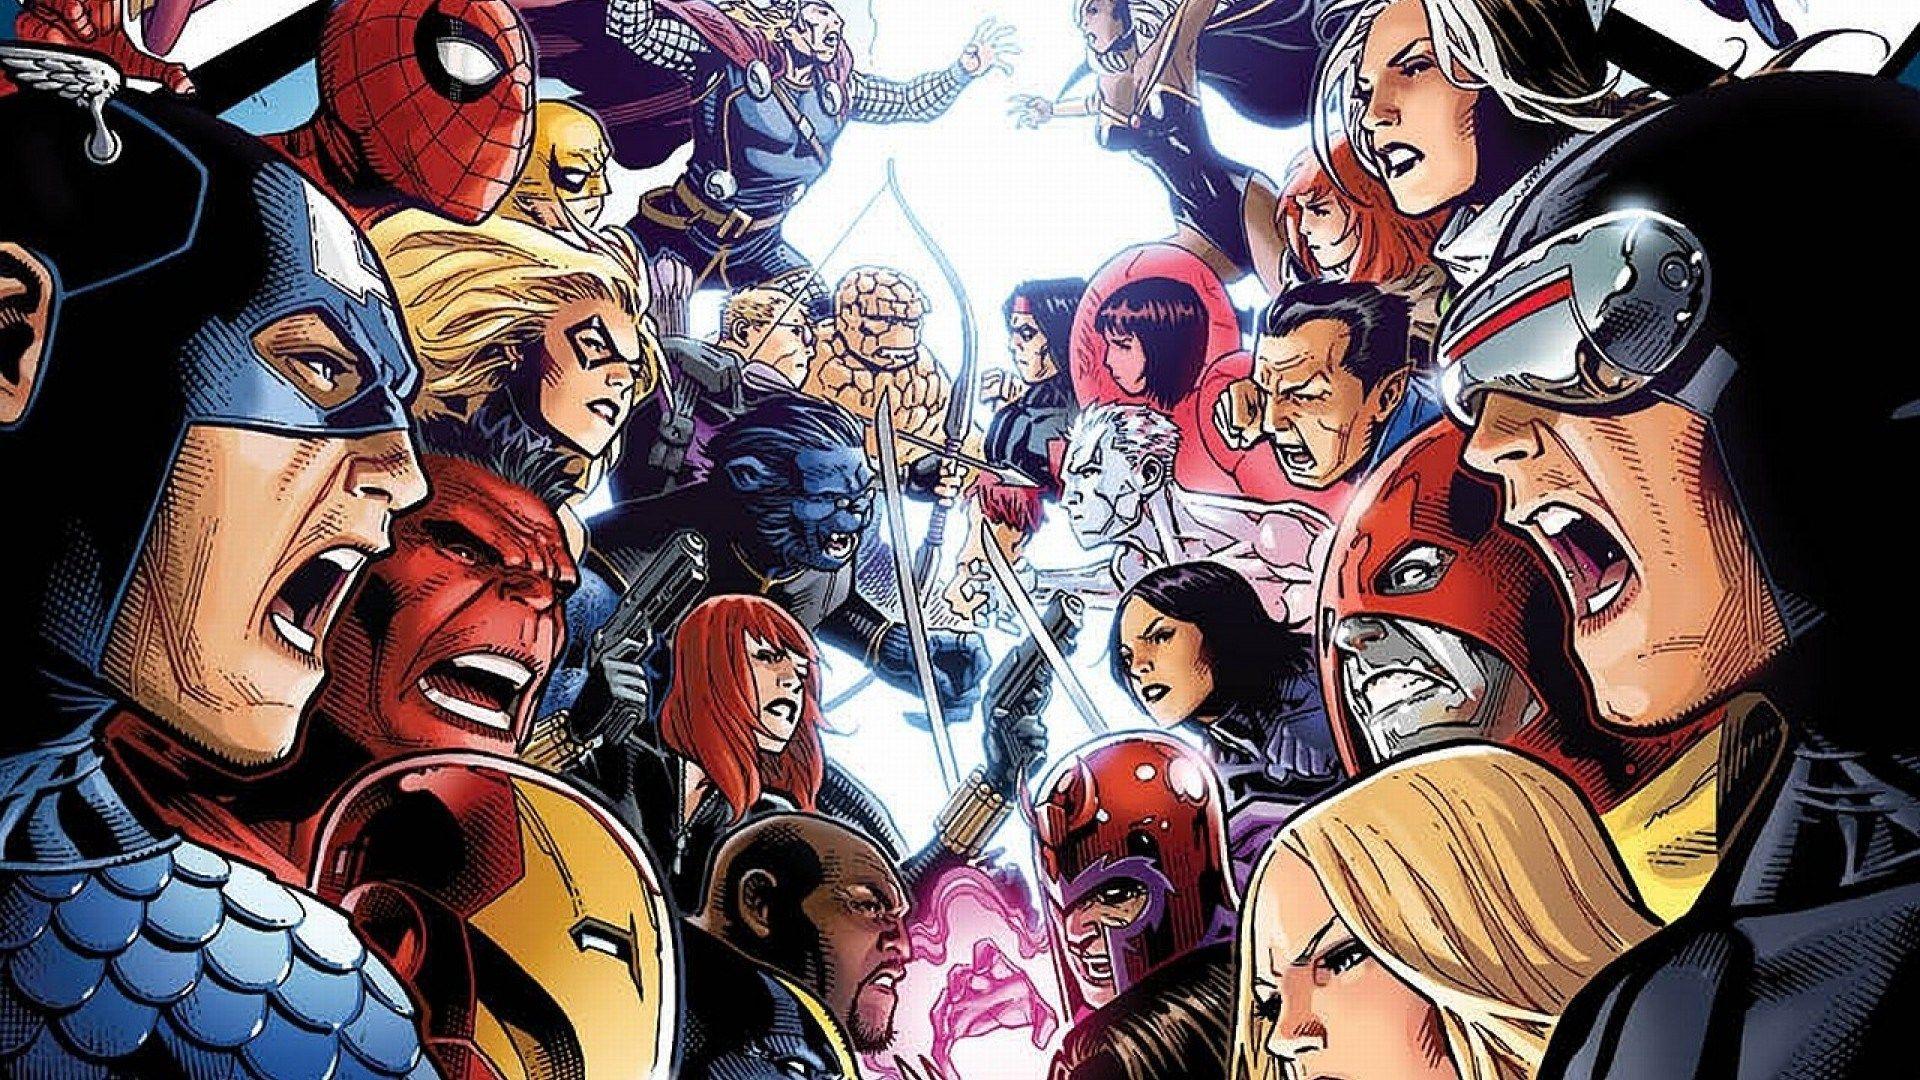 Avengers Vs X Men 1920x1080 Hd Wallpaper Superhero Facts Avengers Marvel Facts